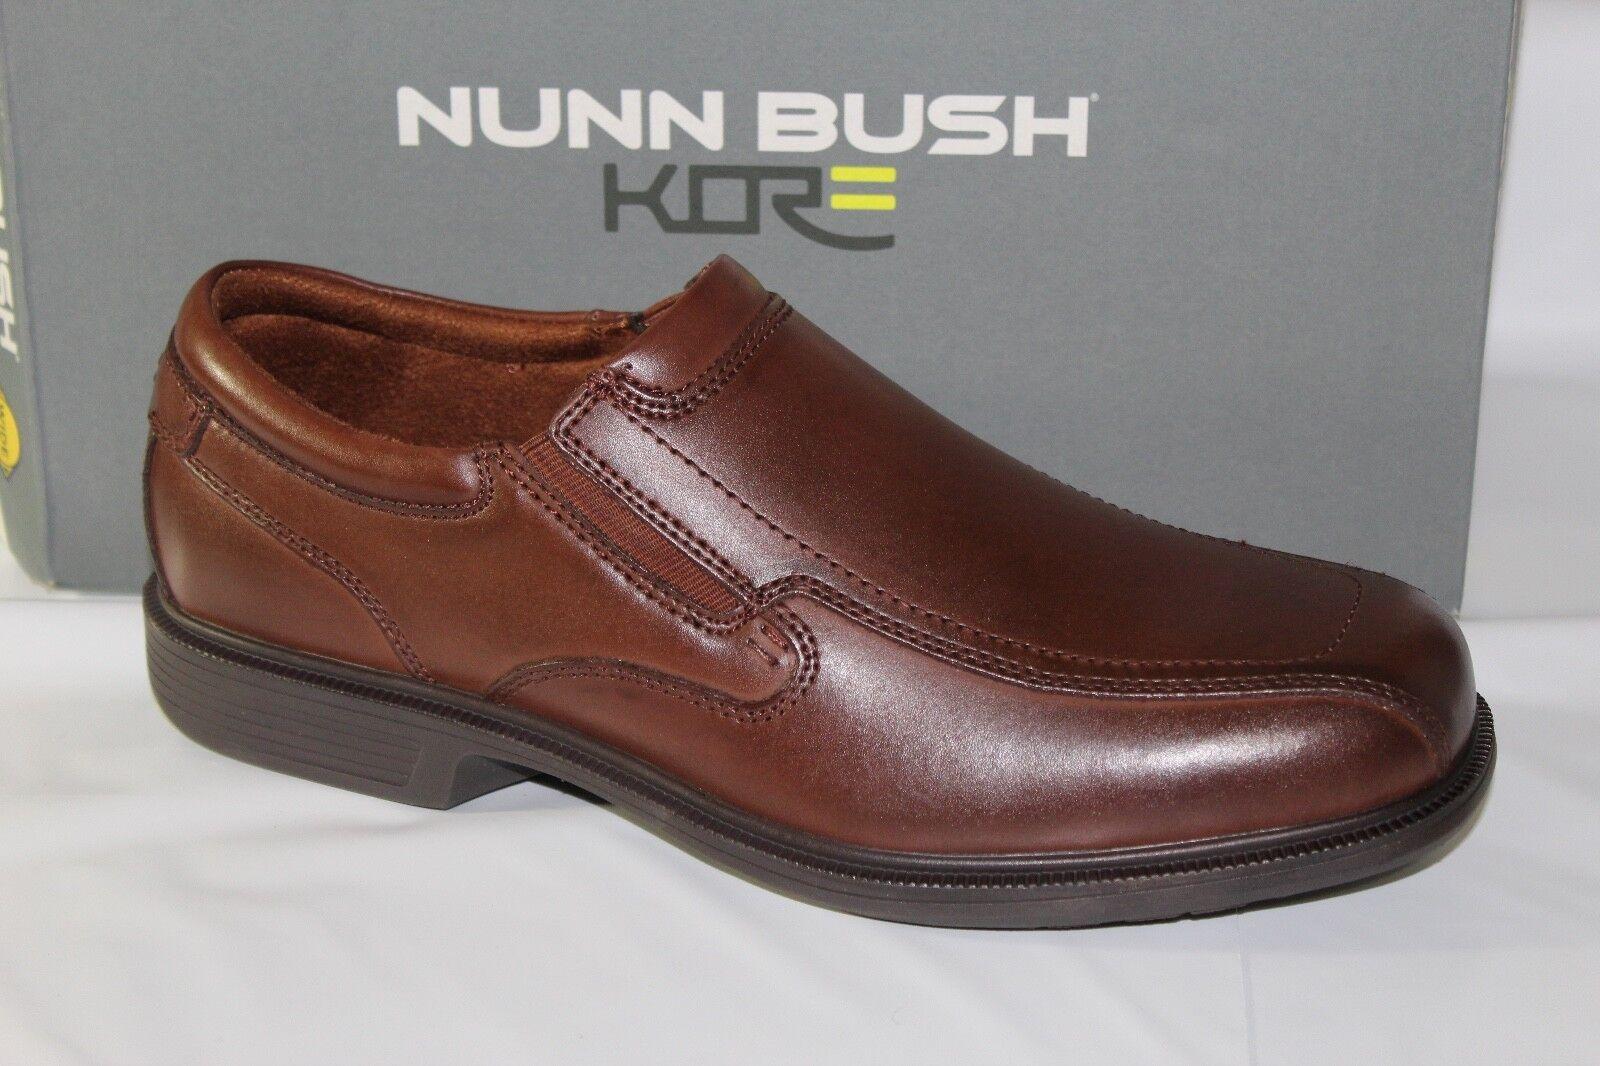 NUNN BUSH BLEEKER ST. Para Hombre Zapato de vestido sin cordones, puntera MOC, tamaño 10.5 amplia, 84357 221